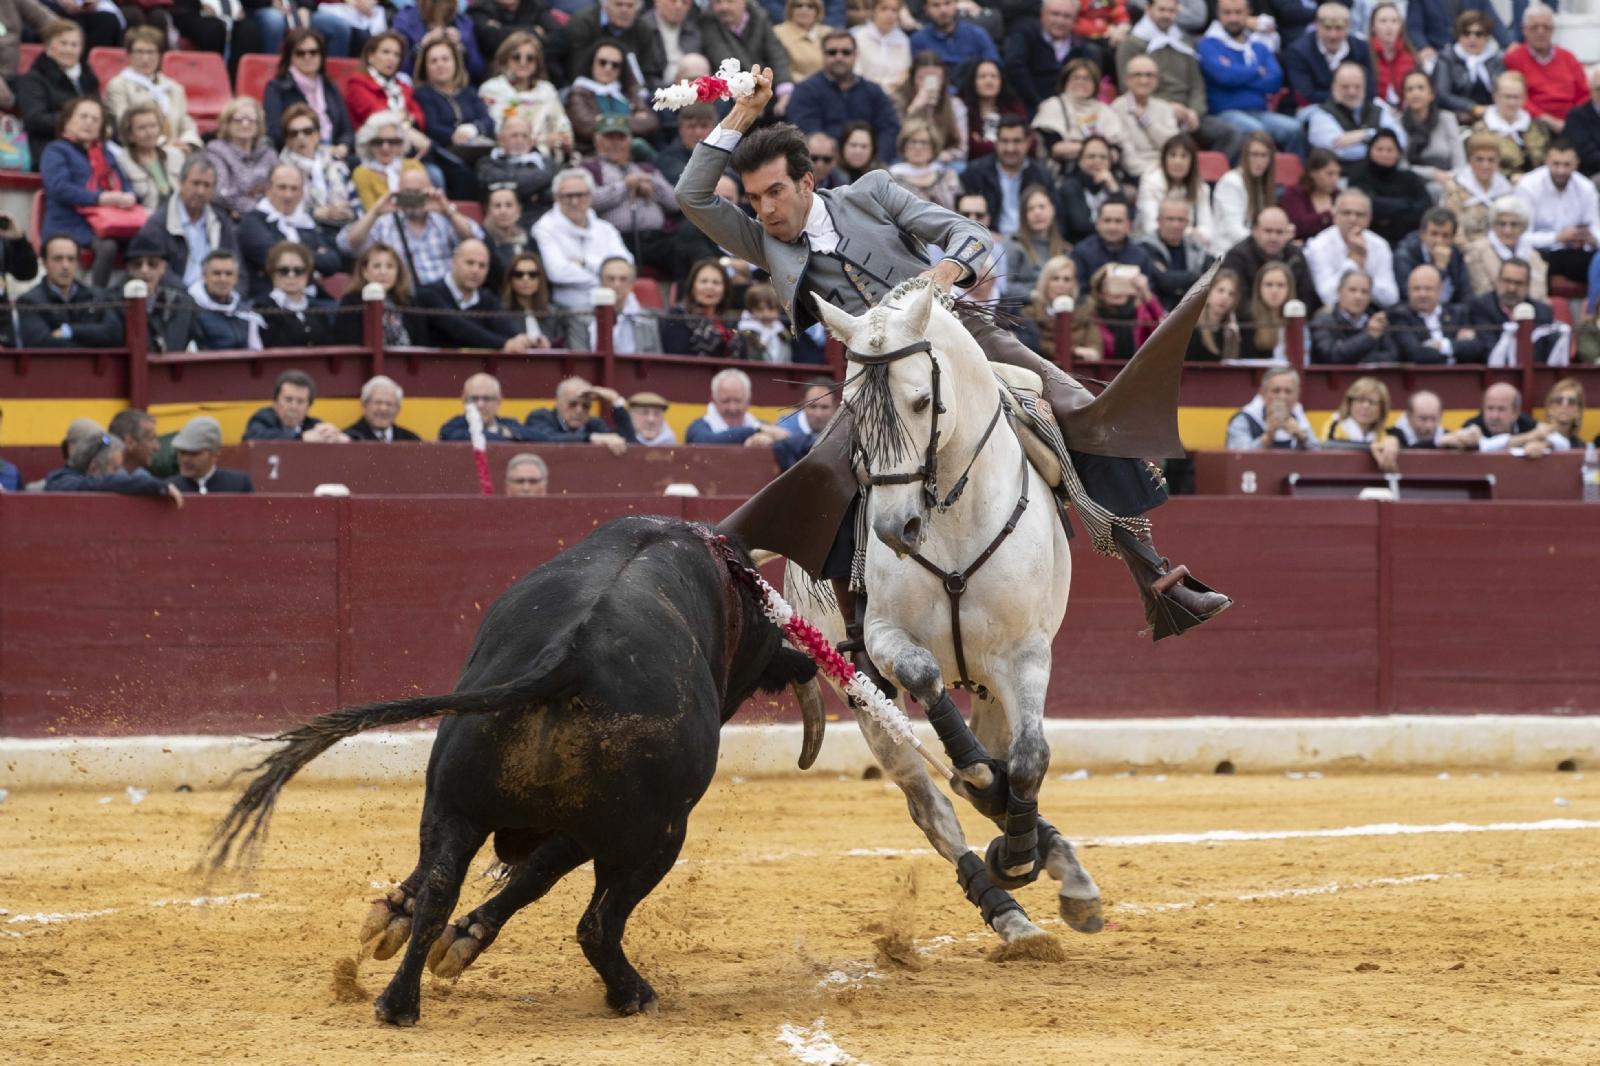 Festival Murcia, burladero TV